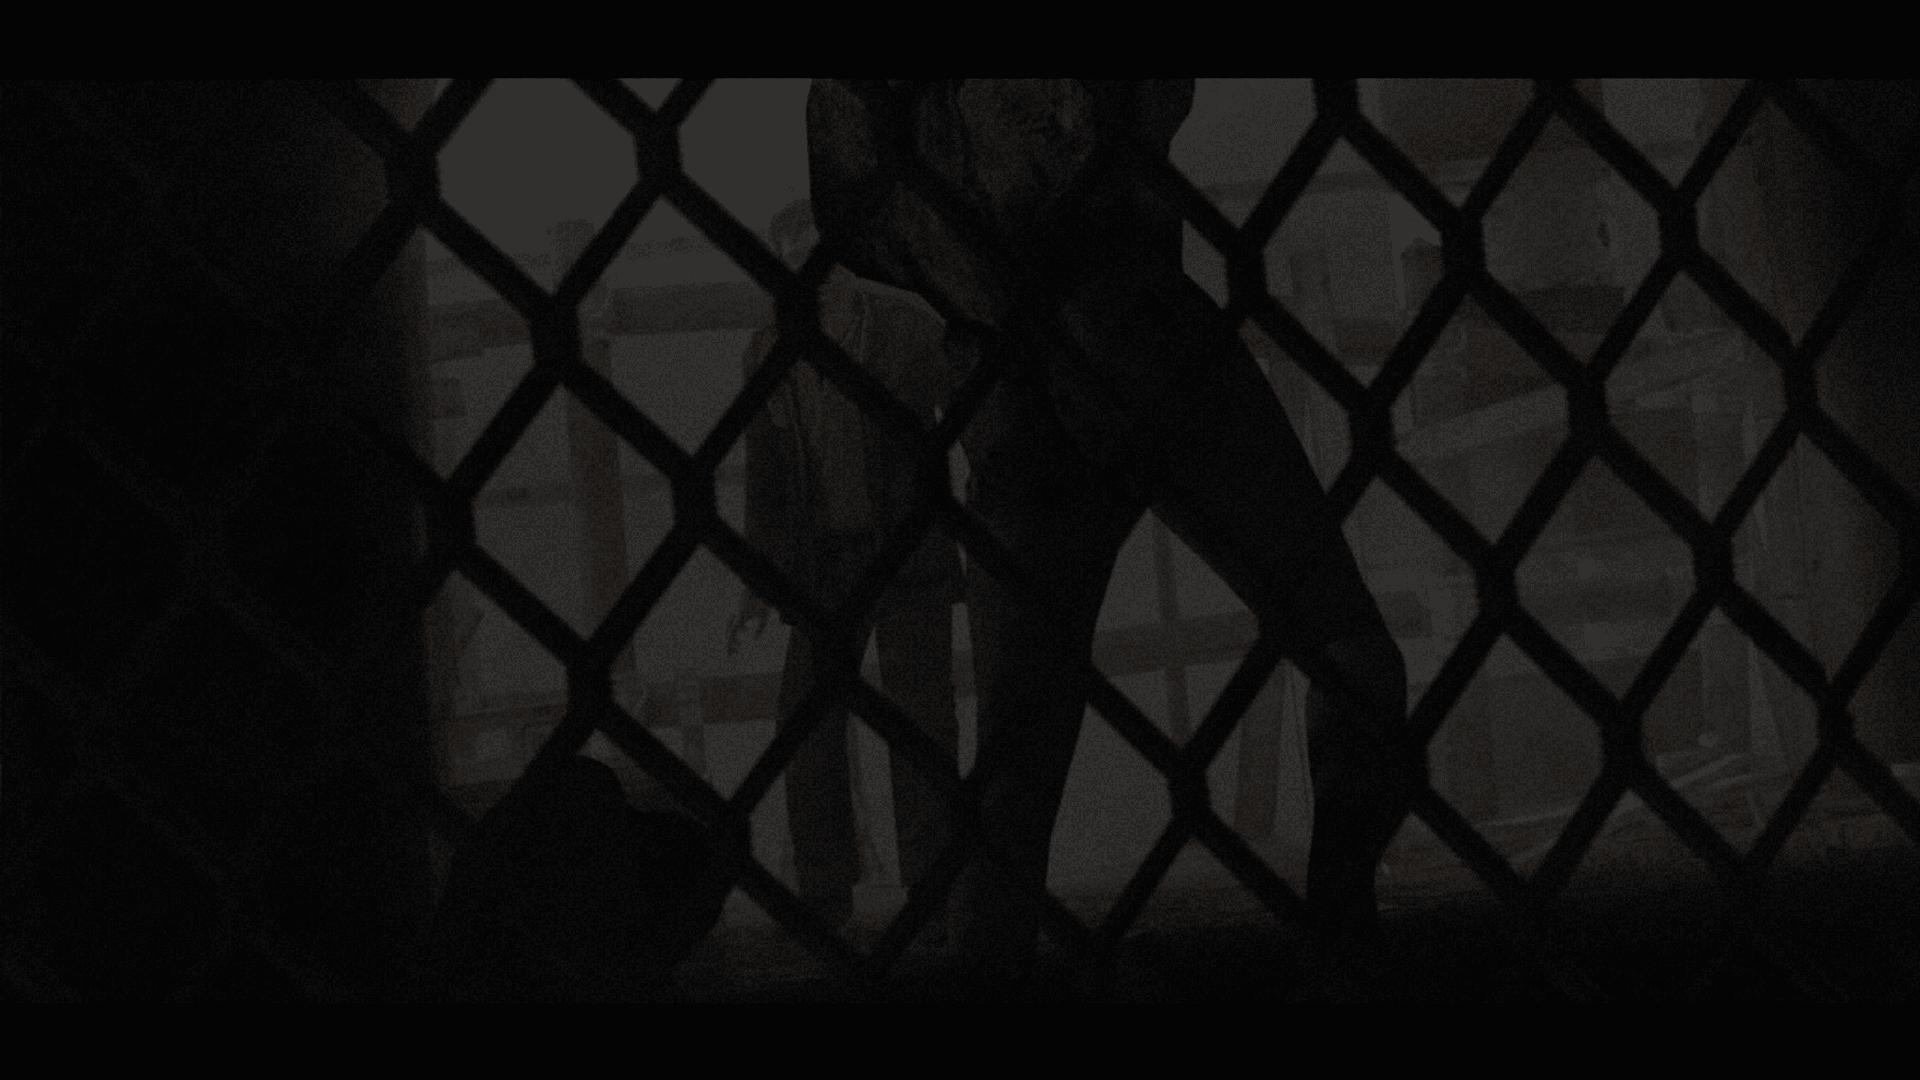 Silent Hill HD